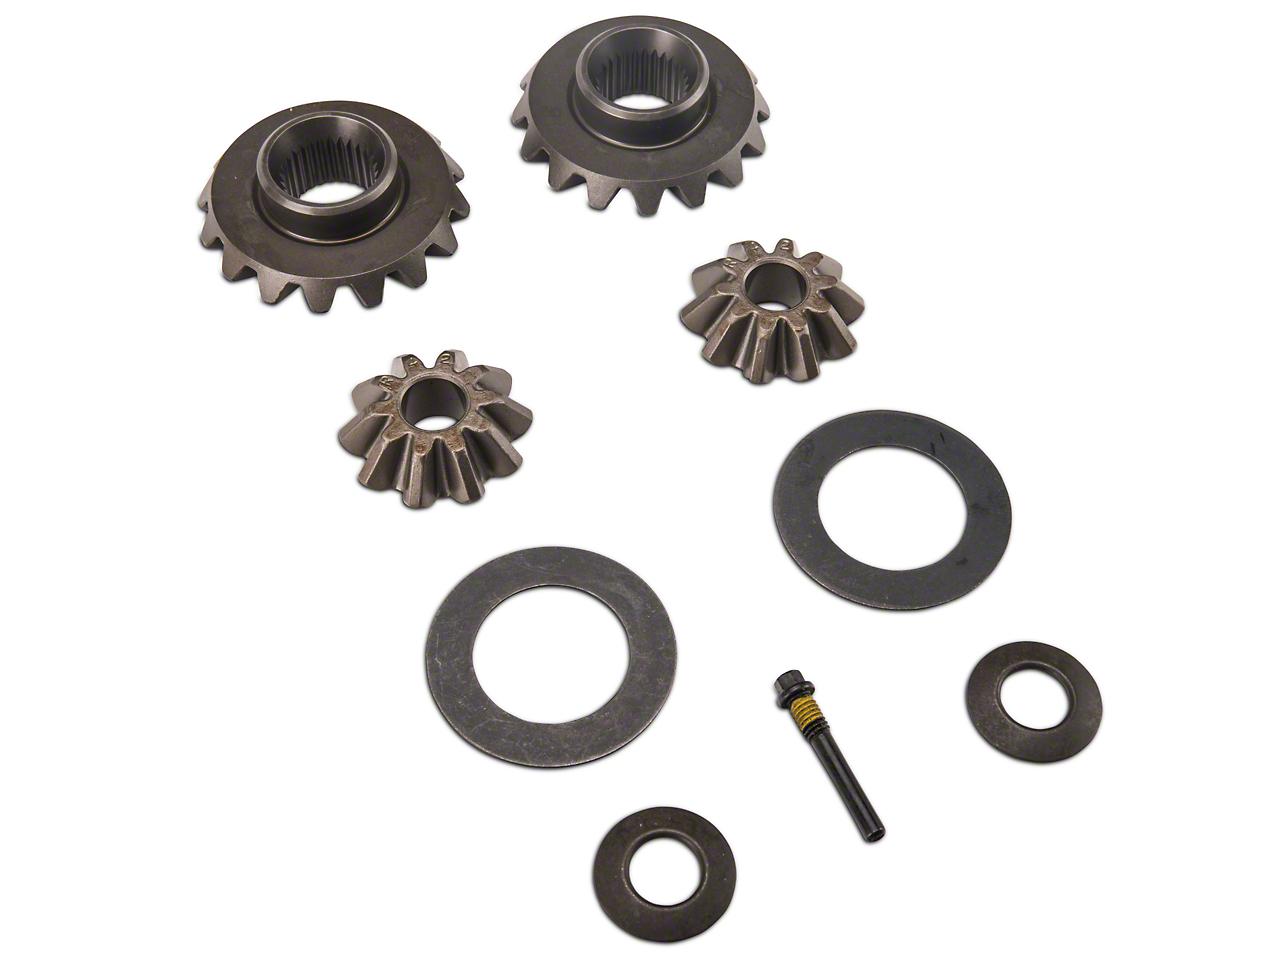 Ford Limited Slip Differential Spider Gears - 28 Spline 8.8 in (86-04 V8; 99 Cobra)